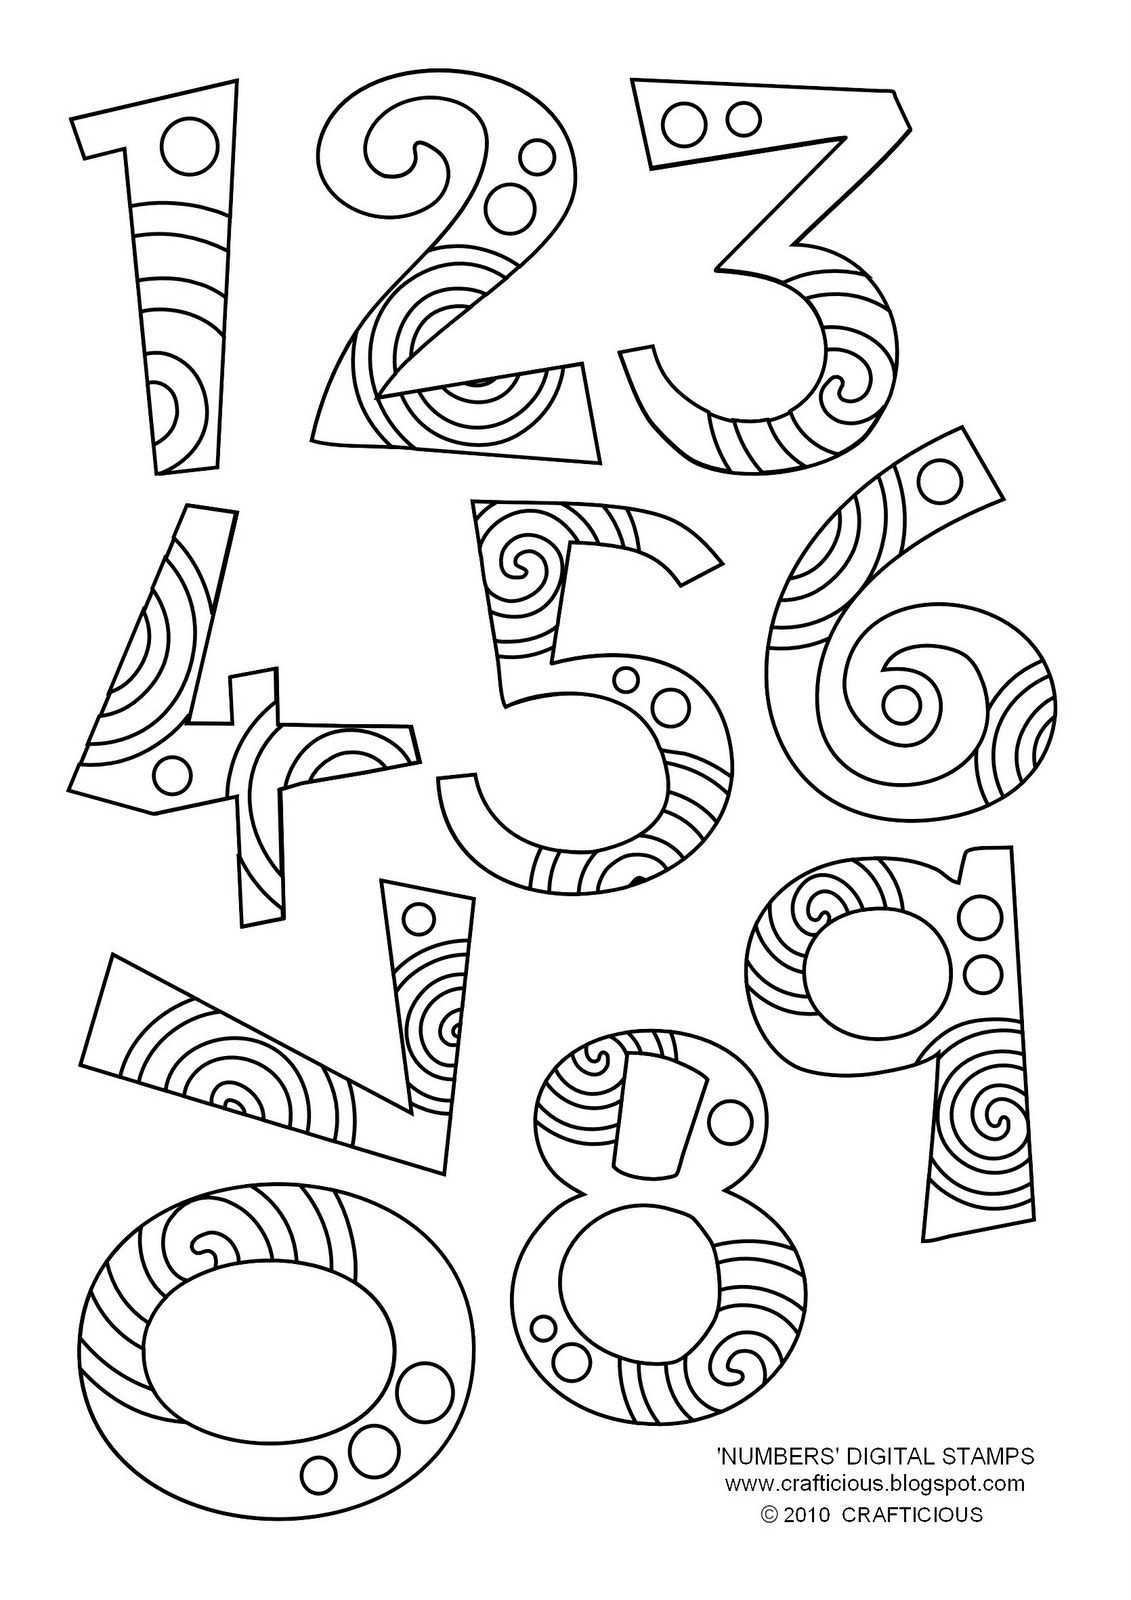 New Year Free Download Digital Stamps Digital Stamps Stamp Doodle Lettering